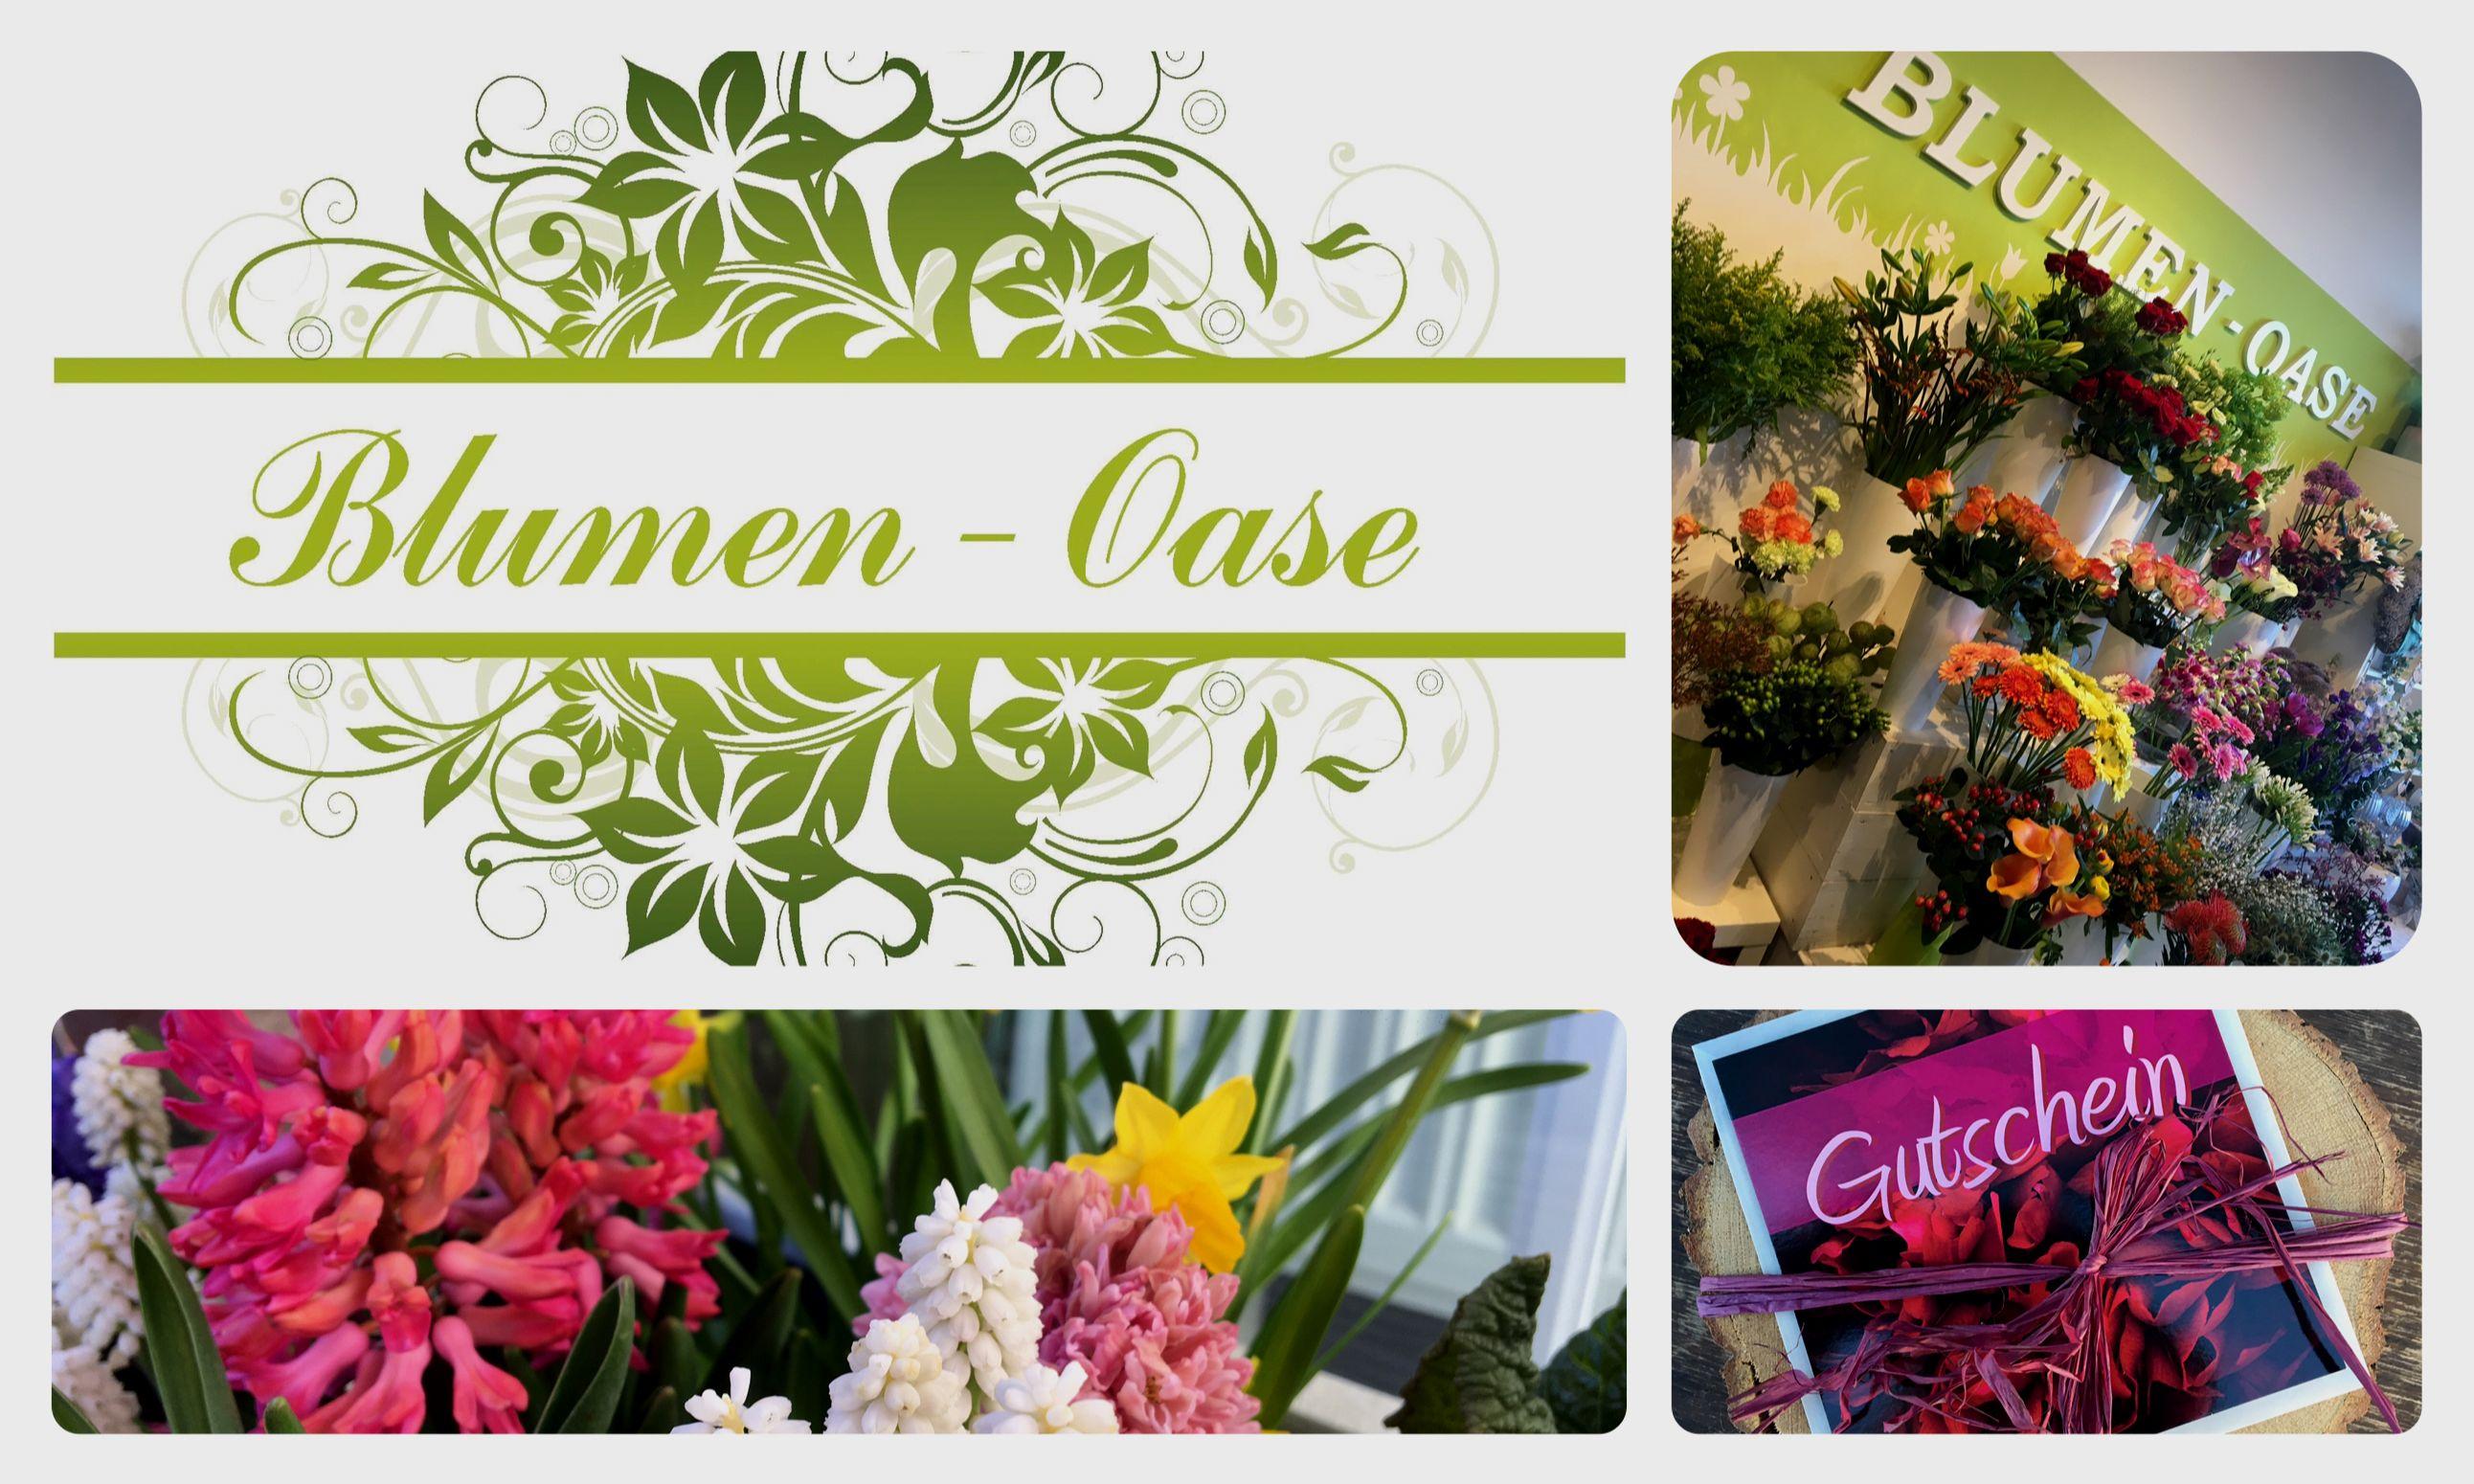 Blumen-Oase